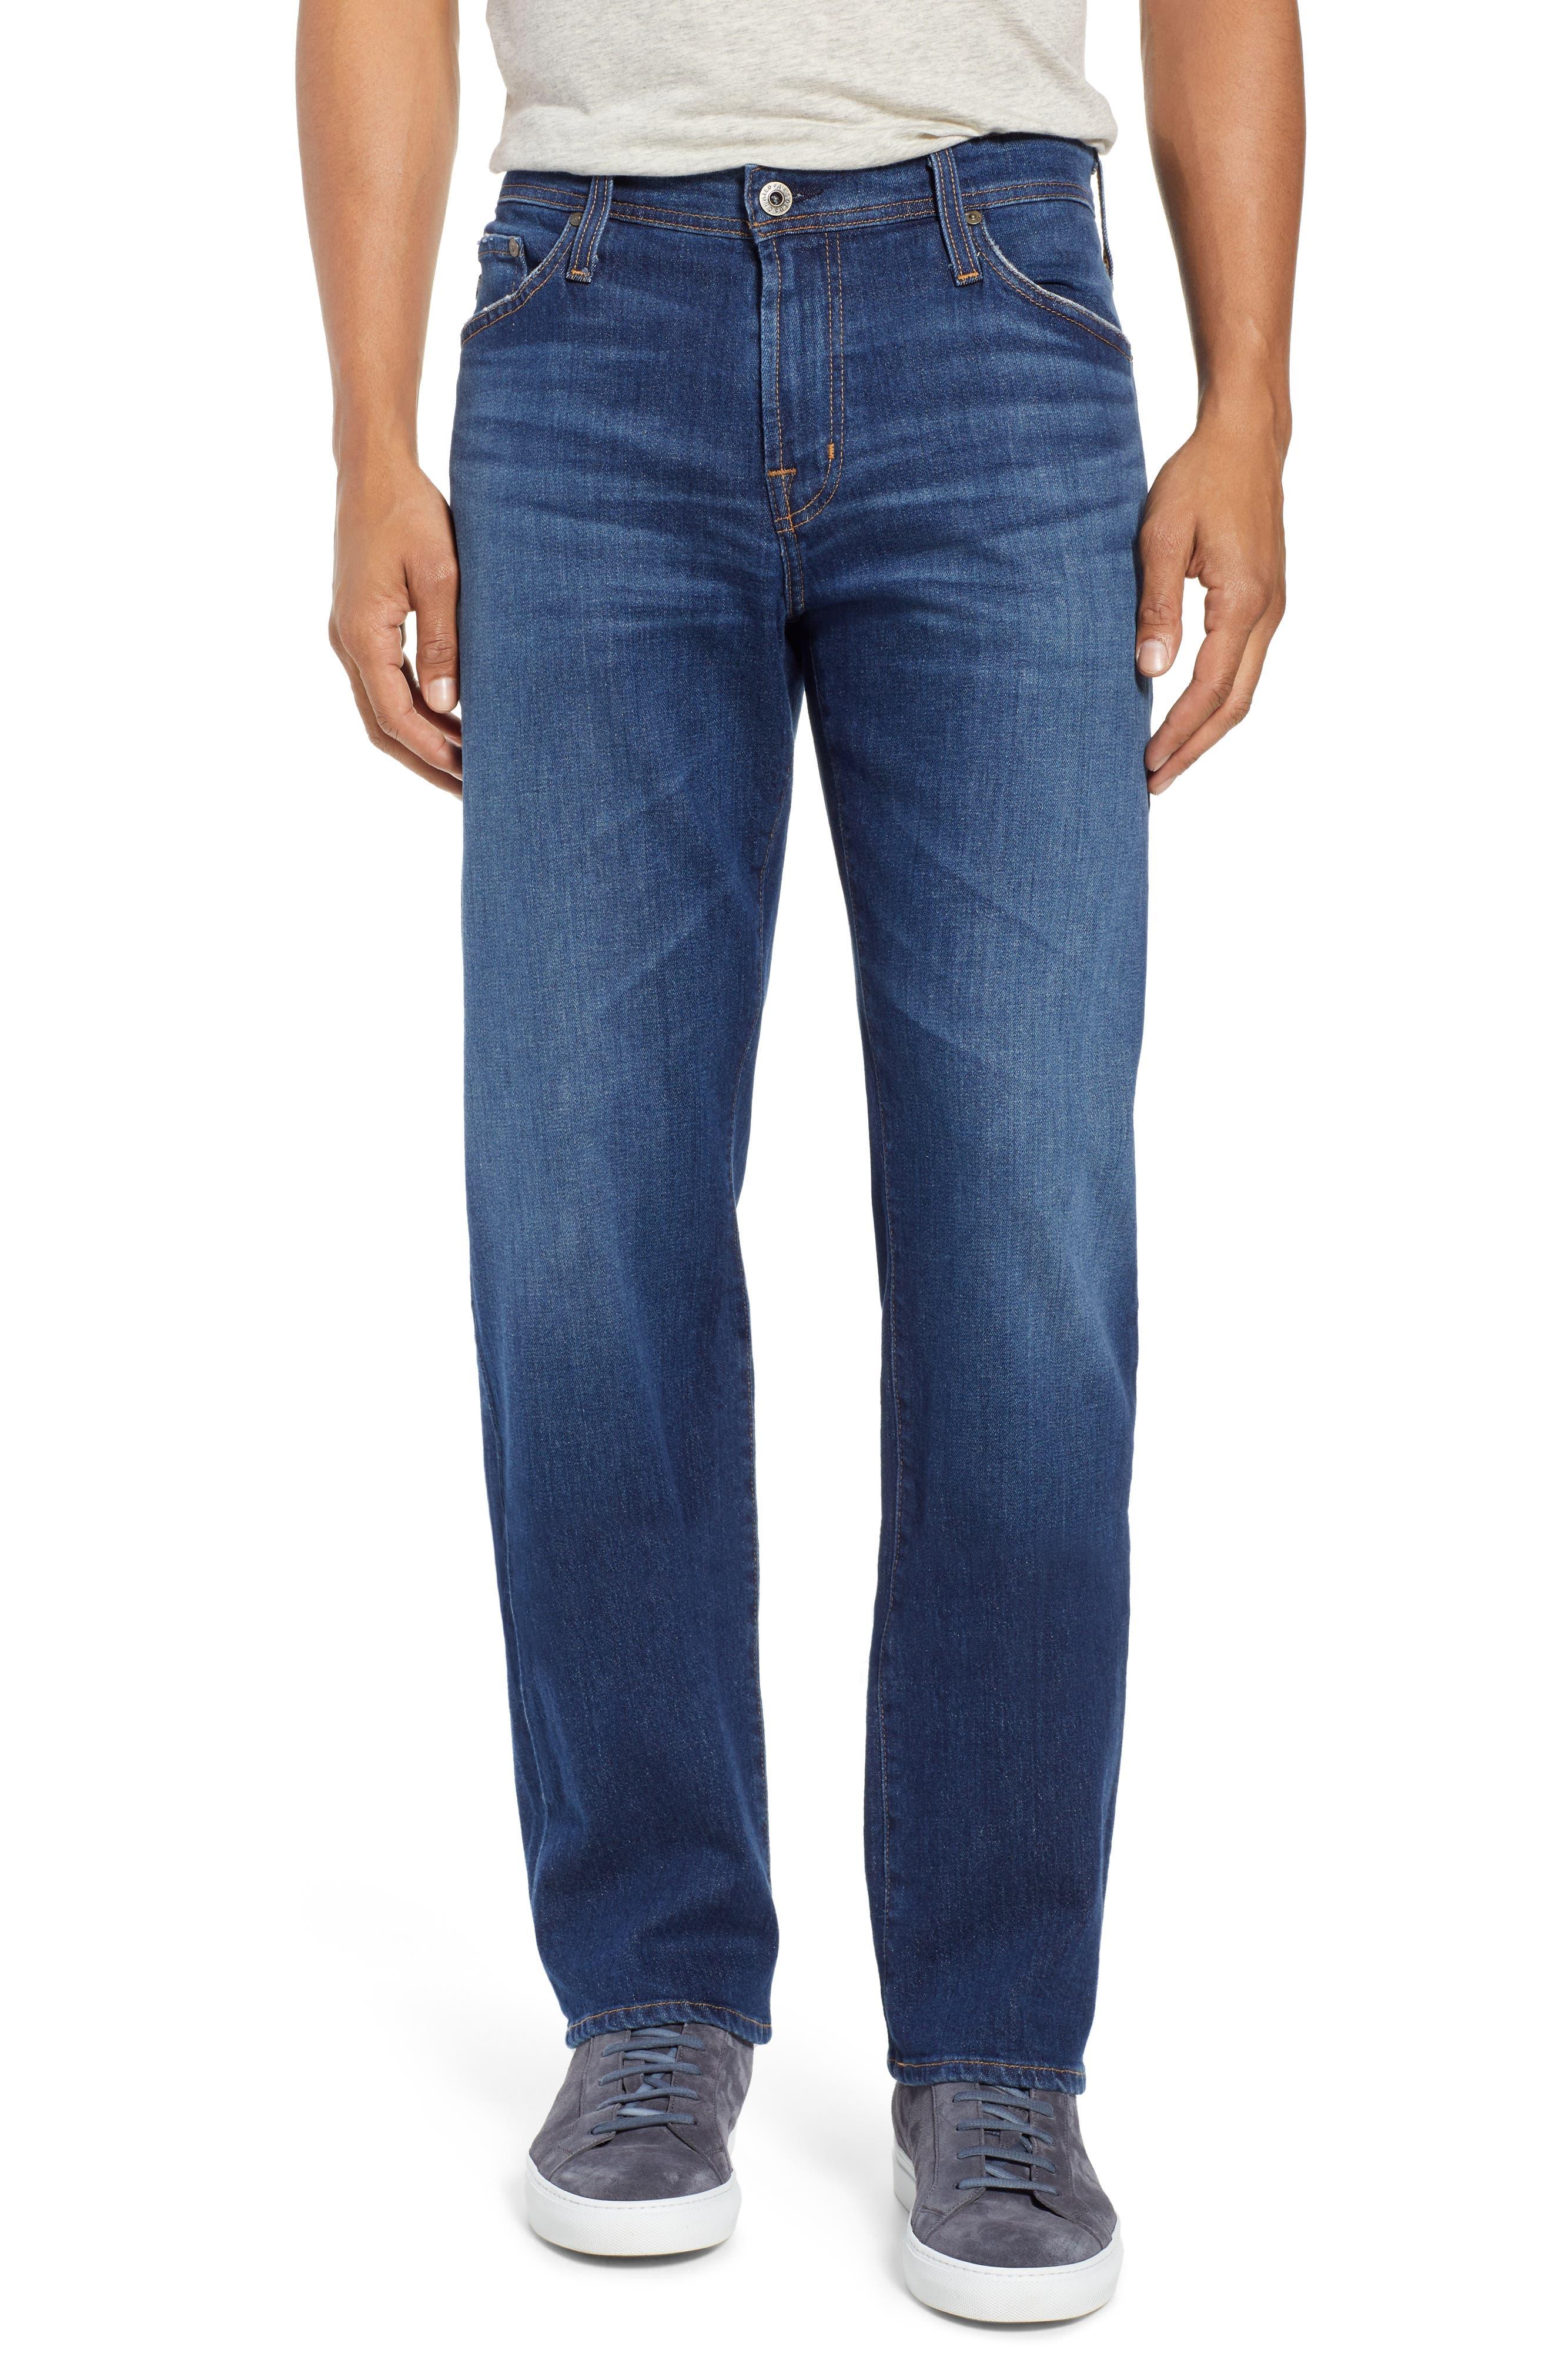 Graduate Slim Straight Leg Jeans,                             Main thumbnail 1, color,                             400